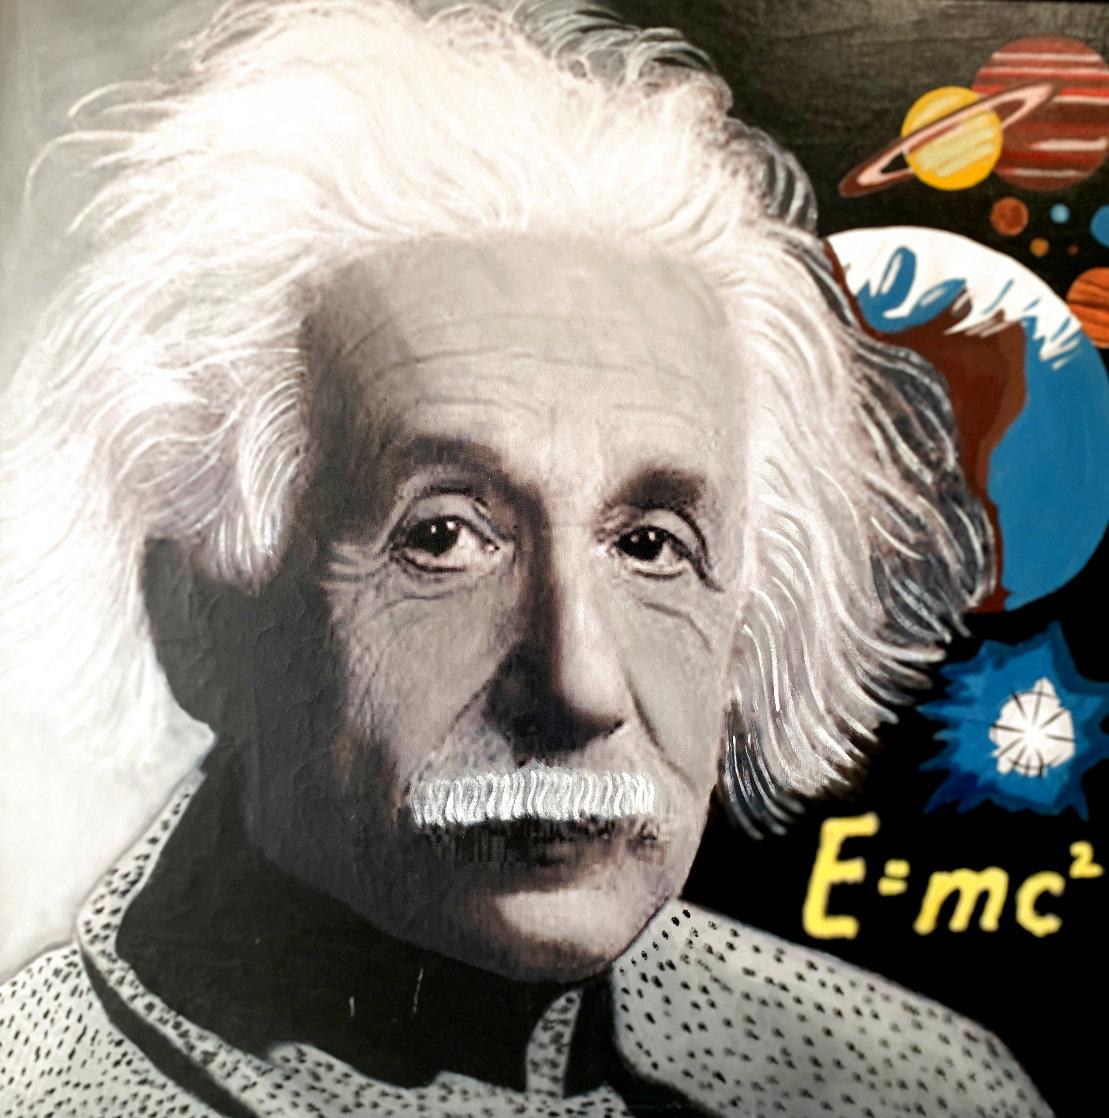 Albert Einstein E=MC2 Unique 48x48 Huge Original Painting by Steve Kaufman